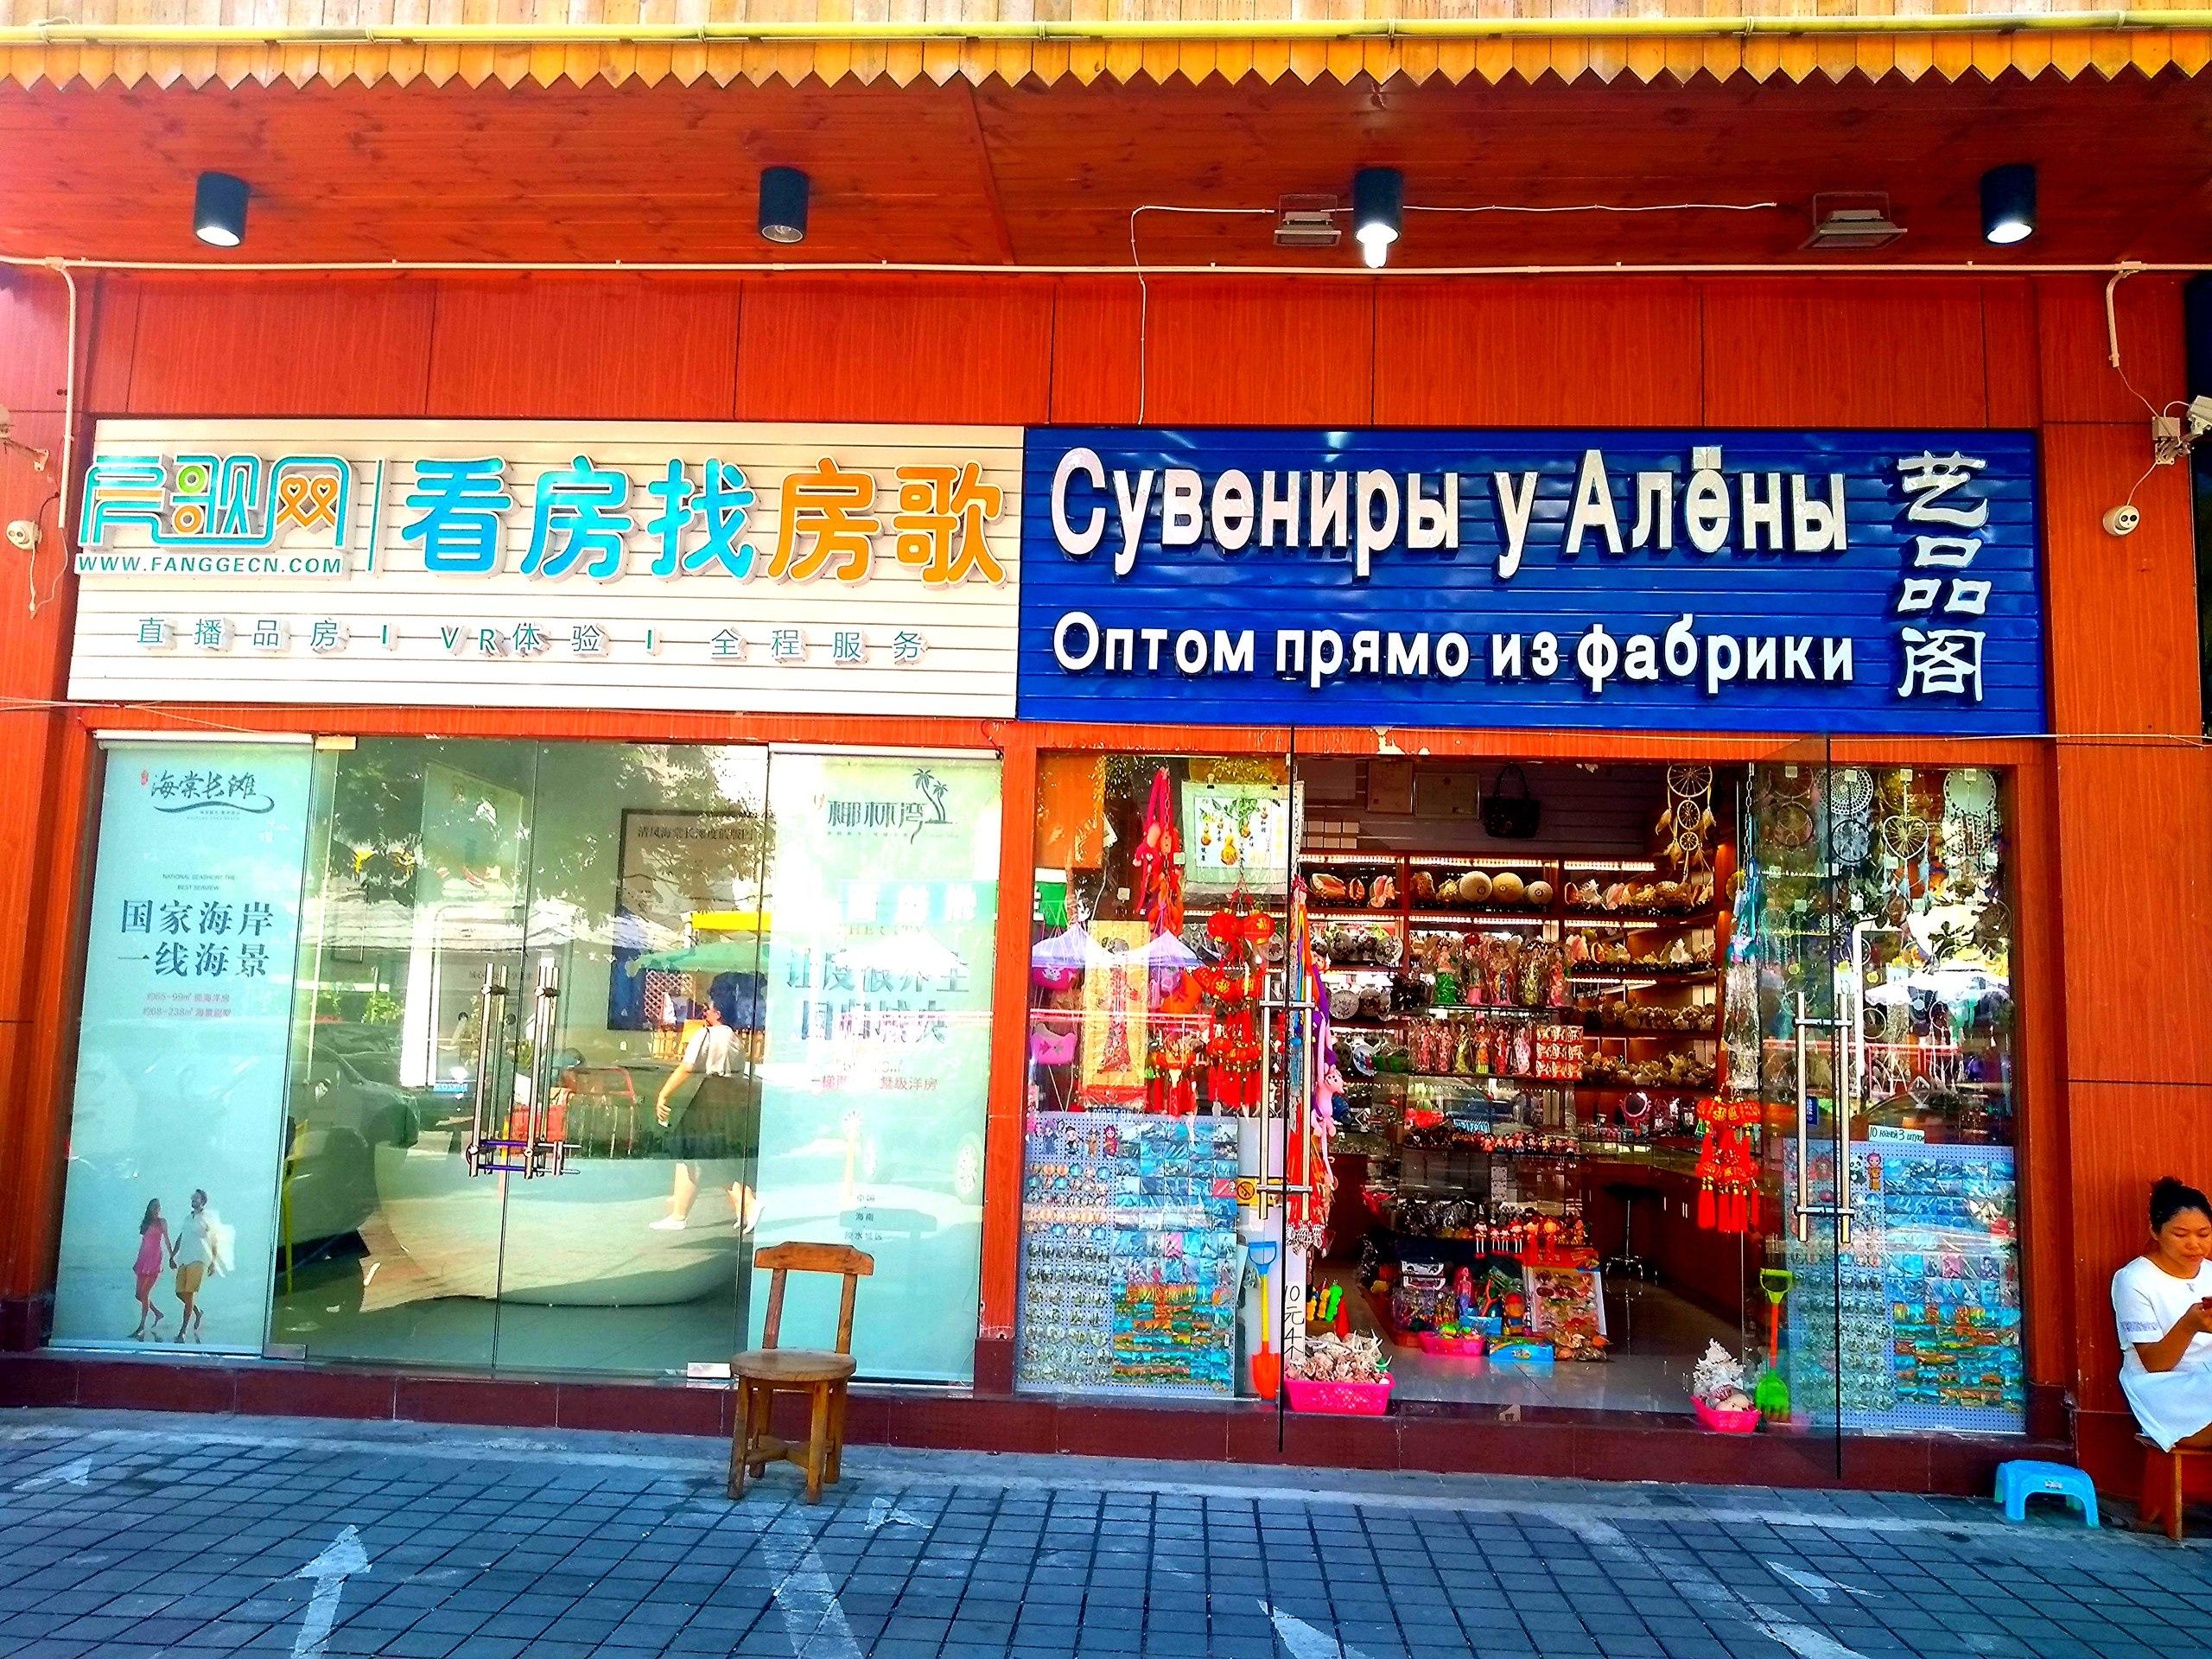 Елена Руденко (Валтея). Китай, о.Хайнань, г.Санья. (фото) - Страница 8 W8h7JSc7W6k